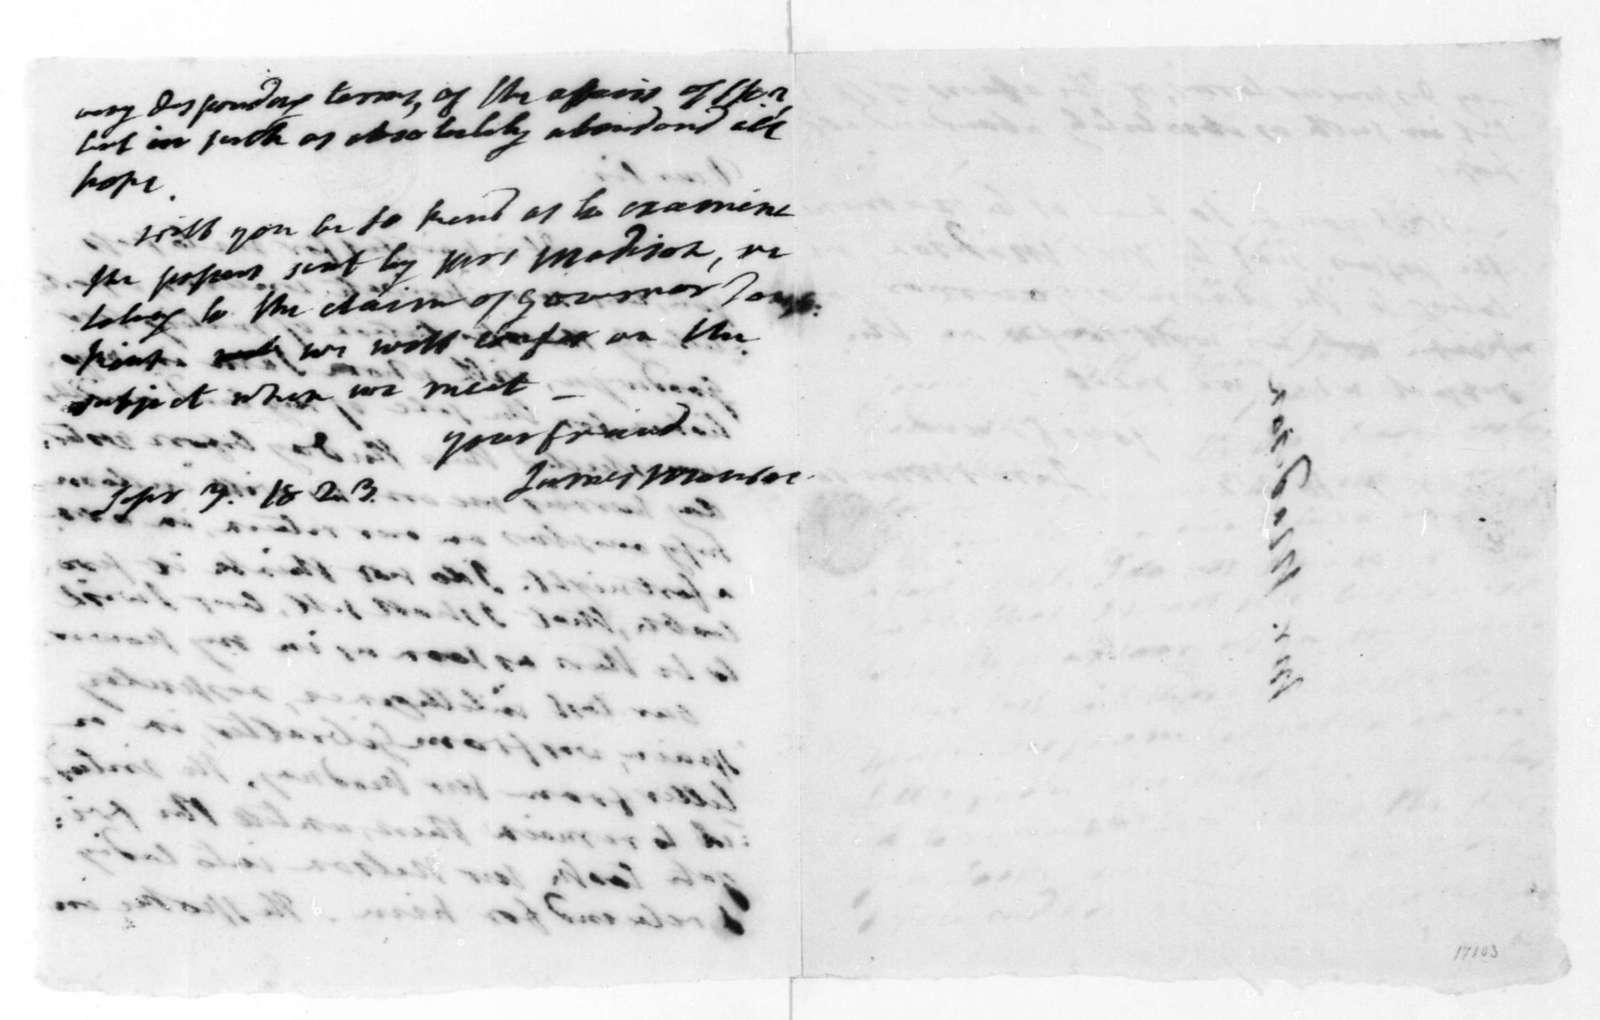 James Monroe to James Madison, September 3, 1823.